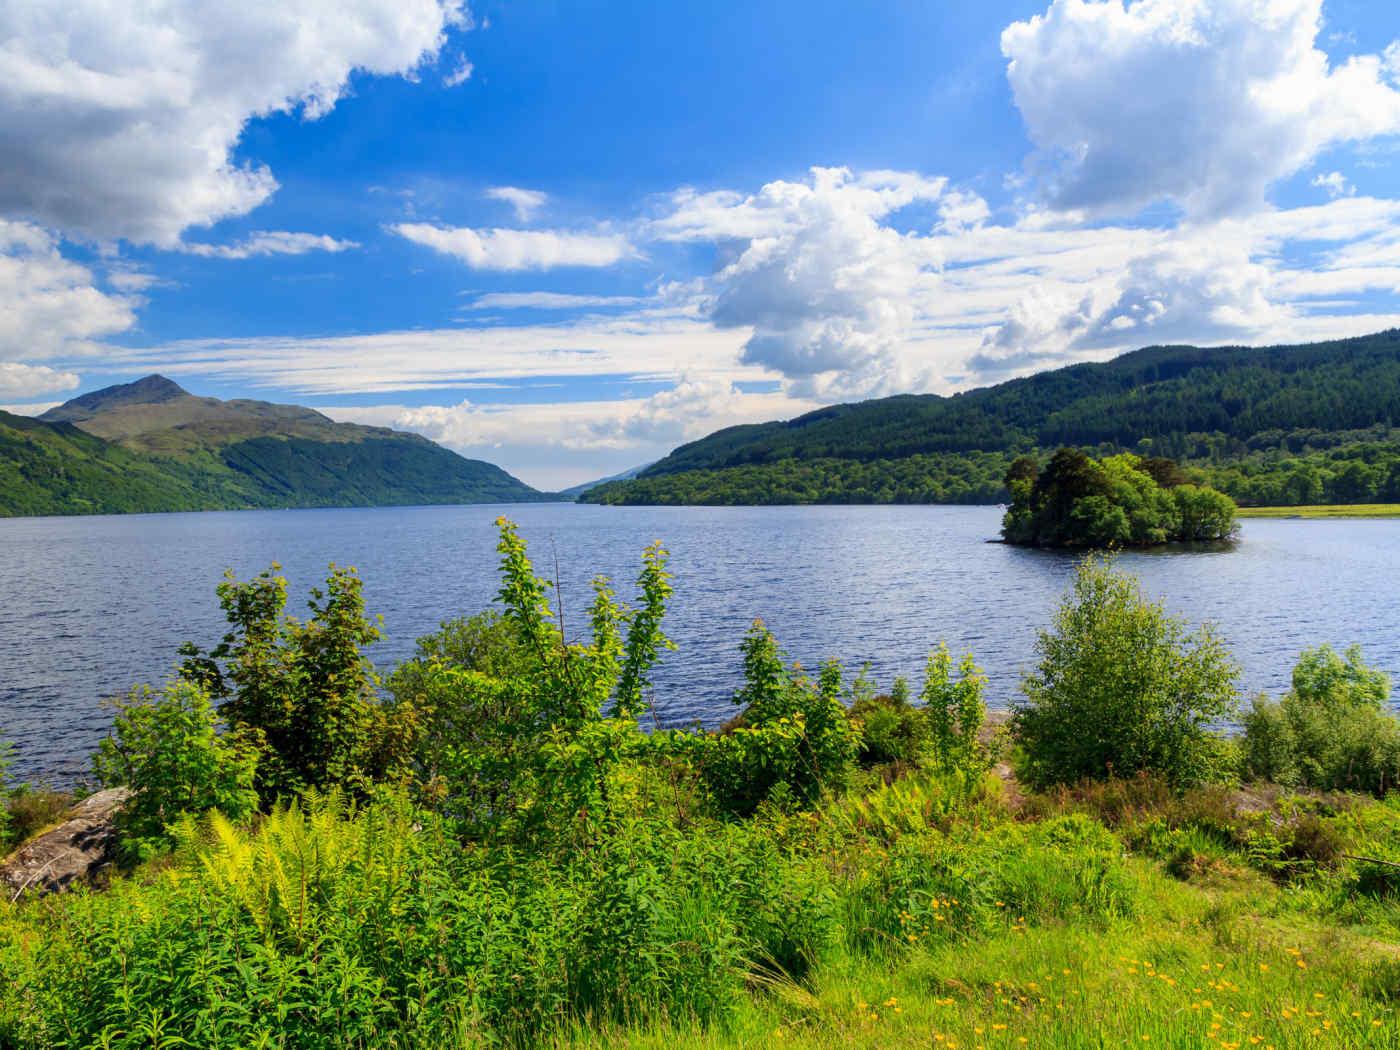 Loch Lomand, Scotland